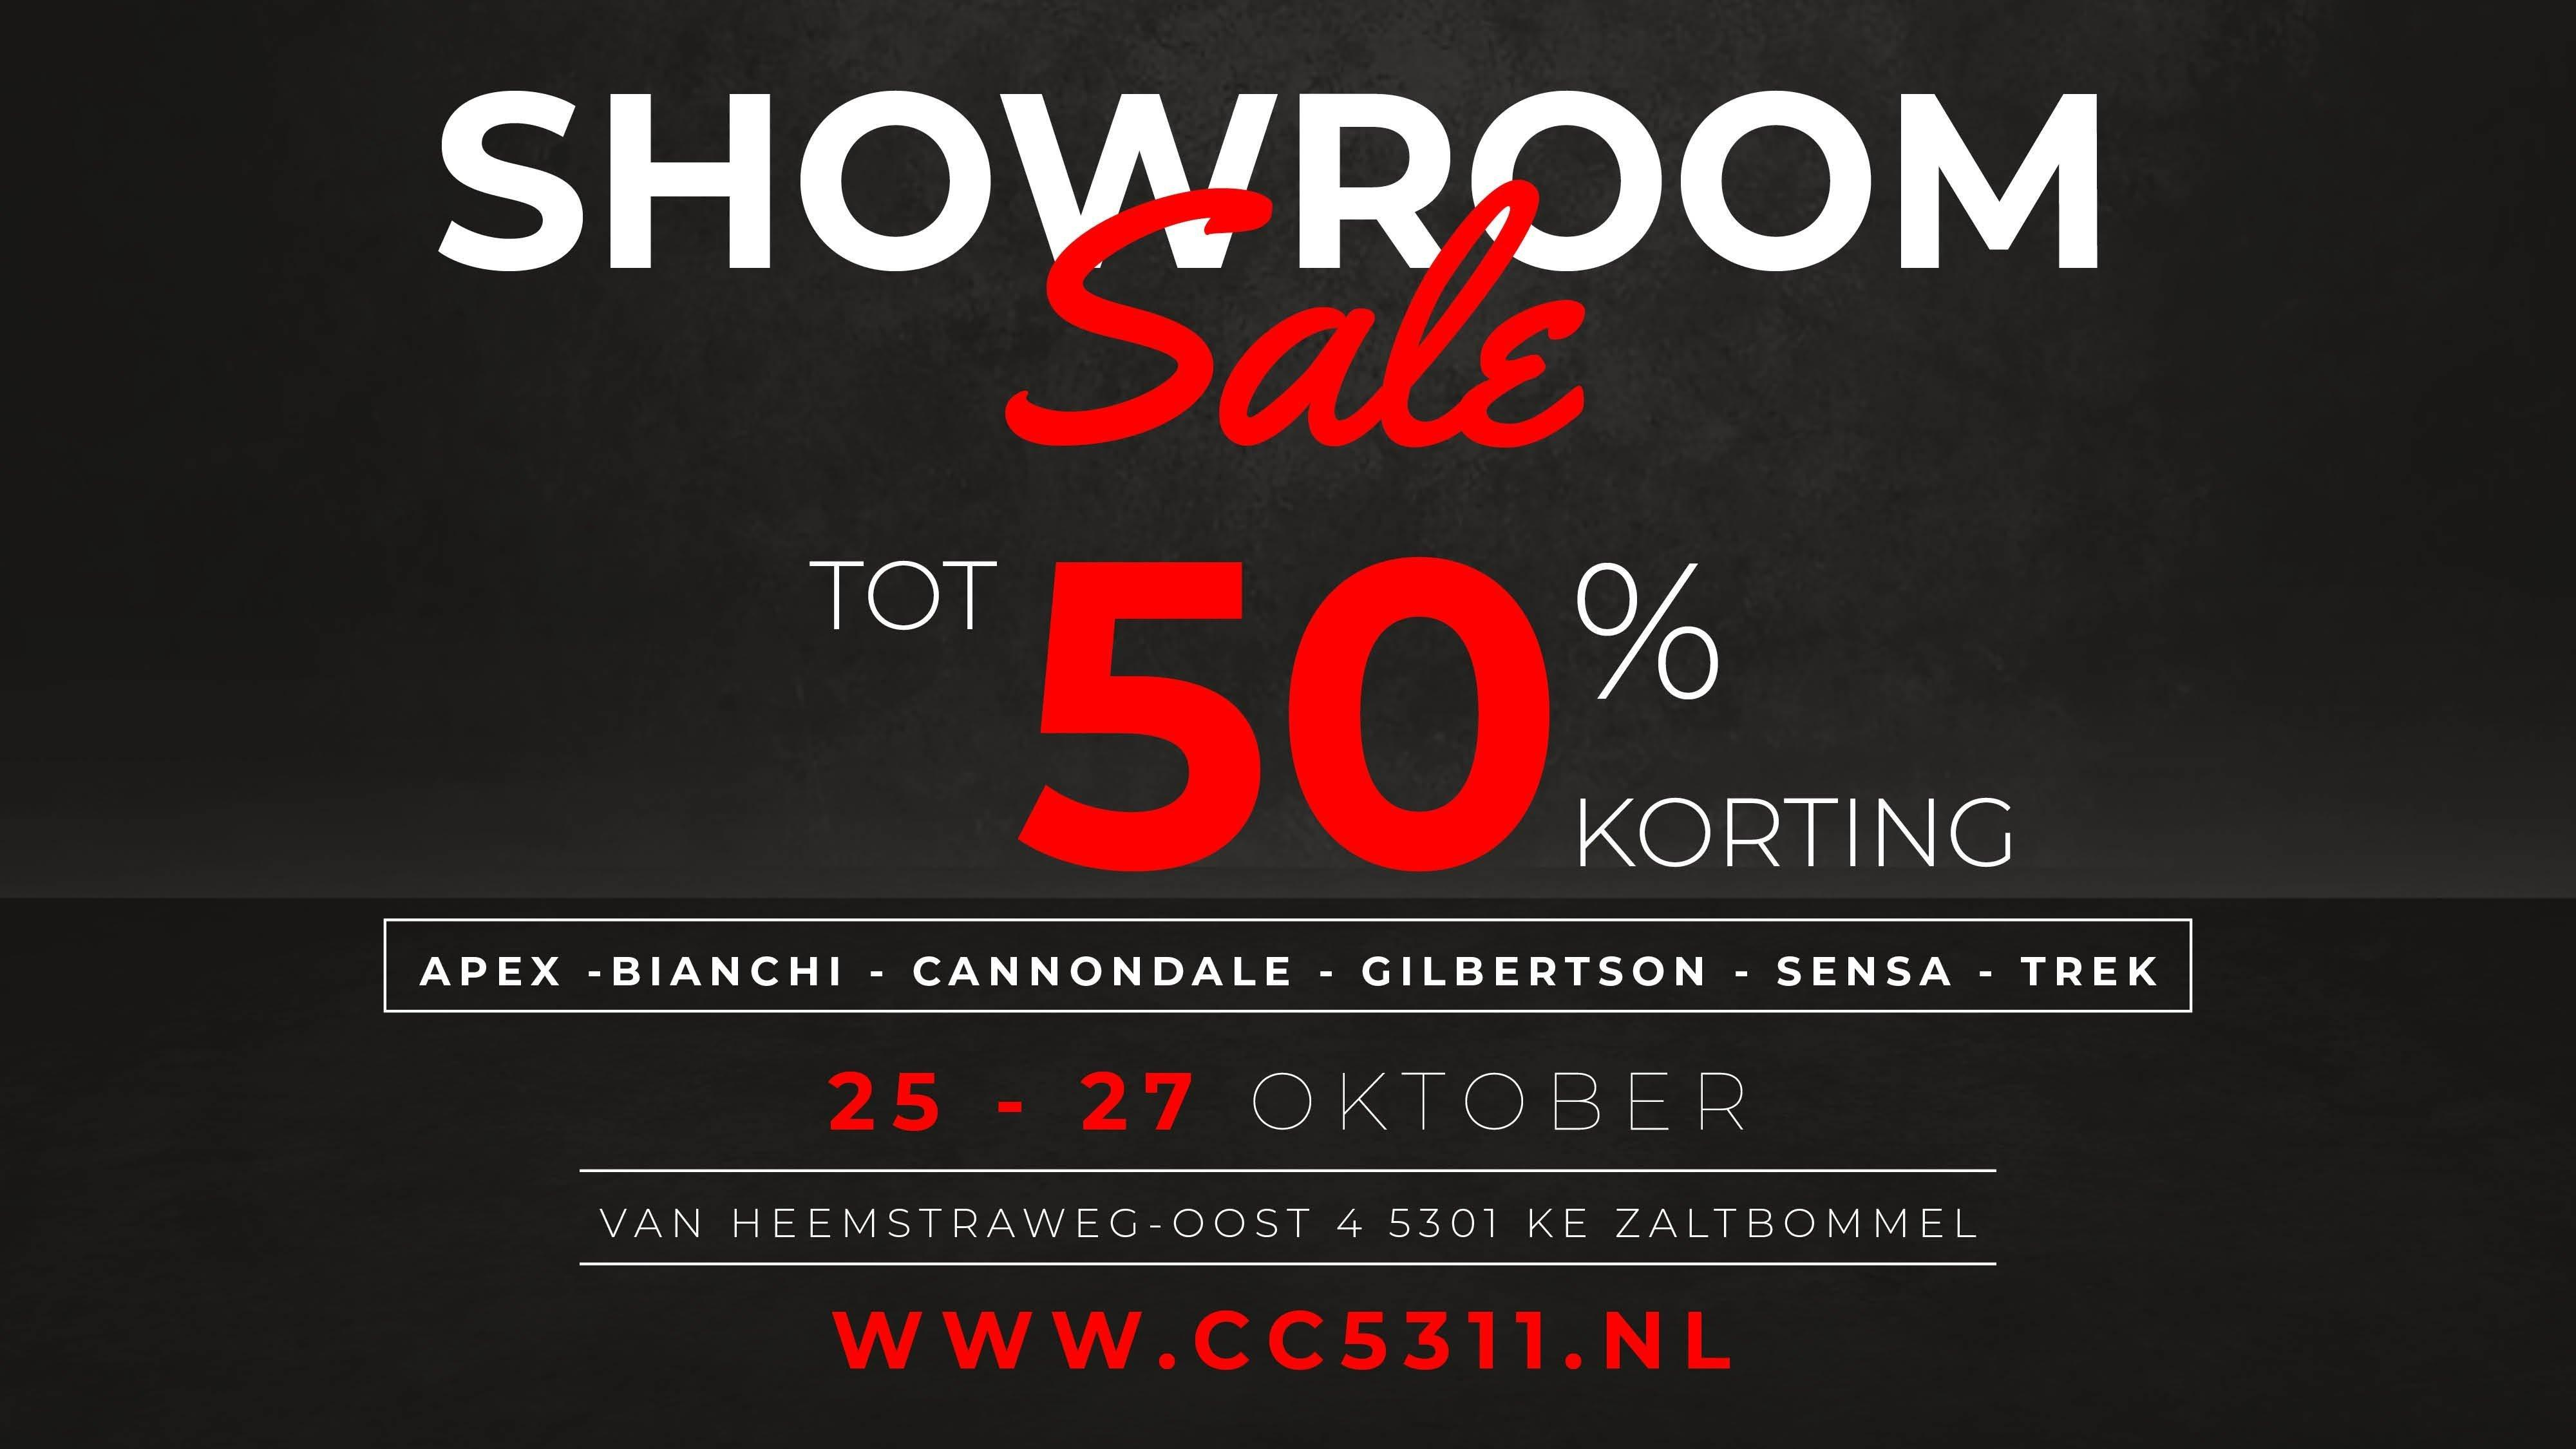 6f82d2aaf90e5a Showroom Sale - CC5311.nl